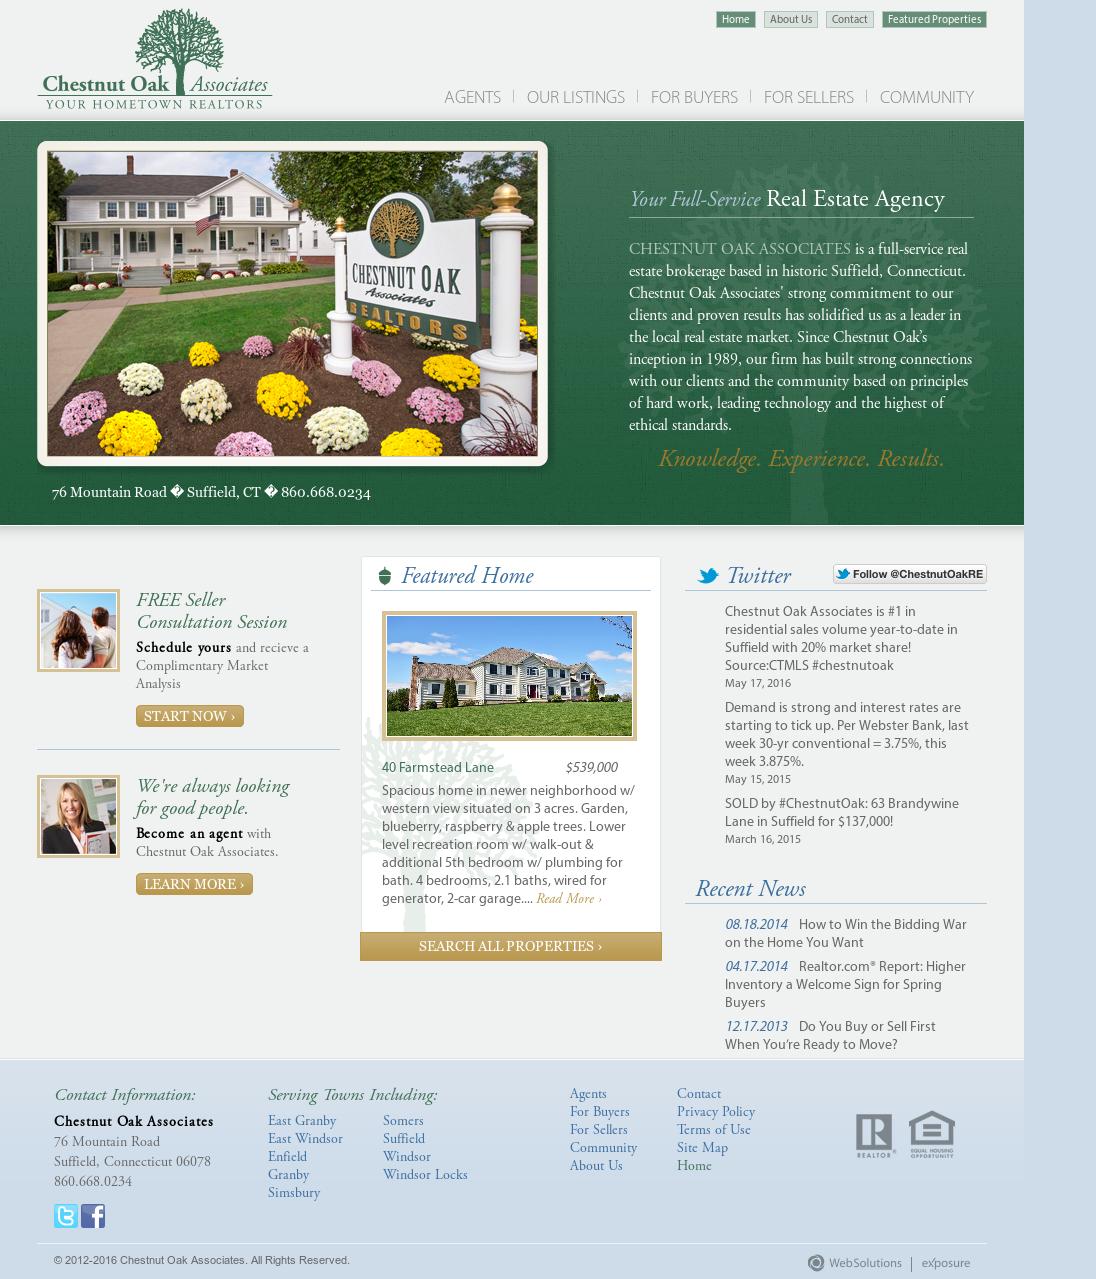 Chestnut Oak Associates Competitors, Revenue and Employees